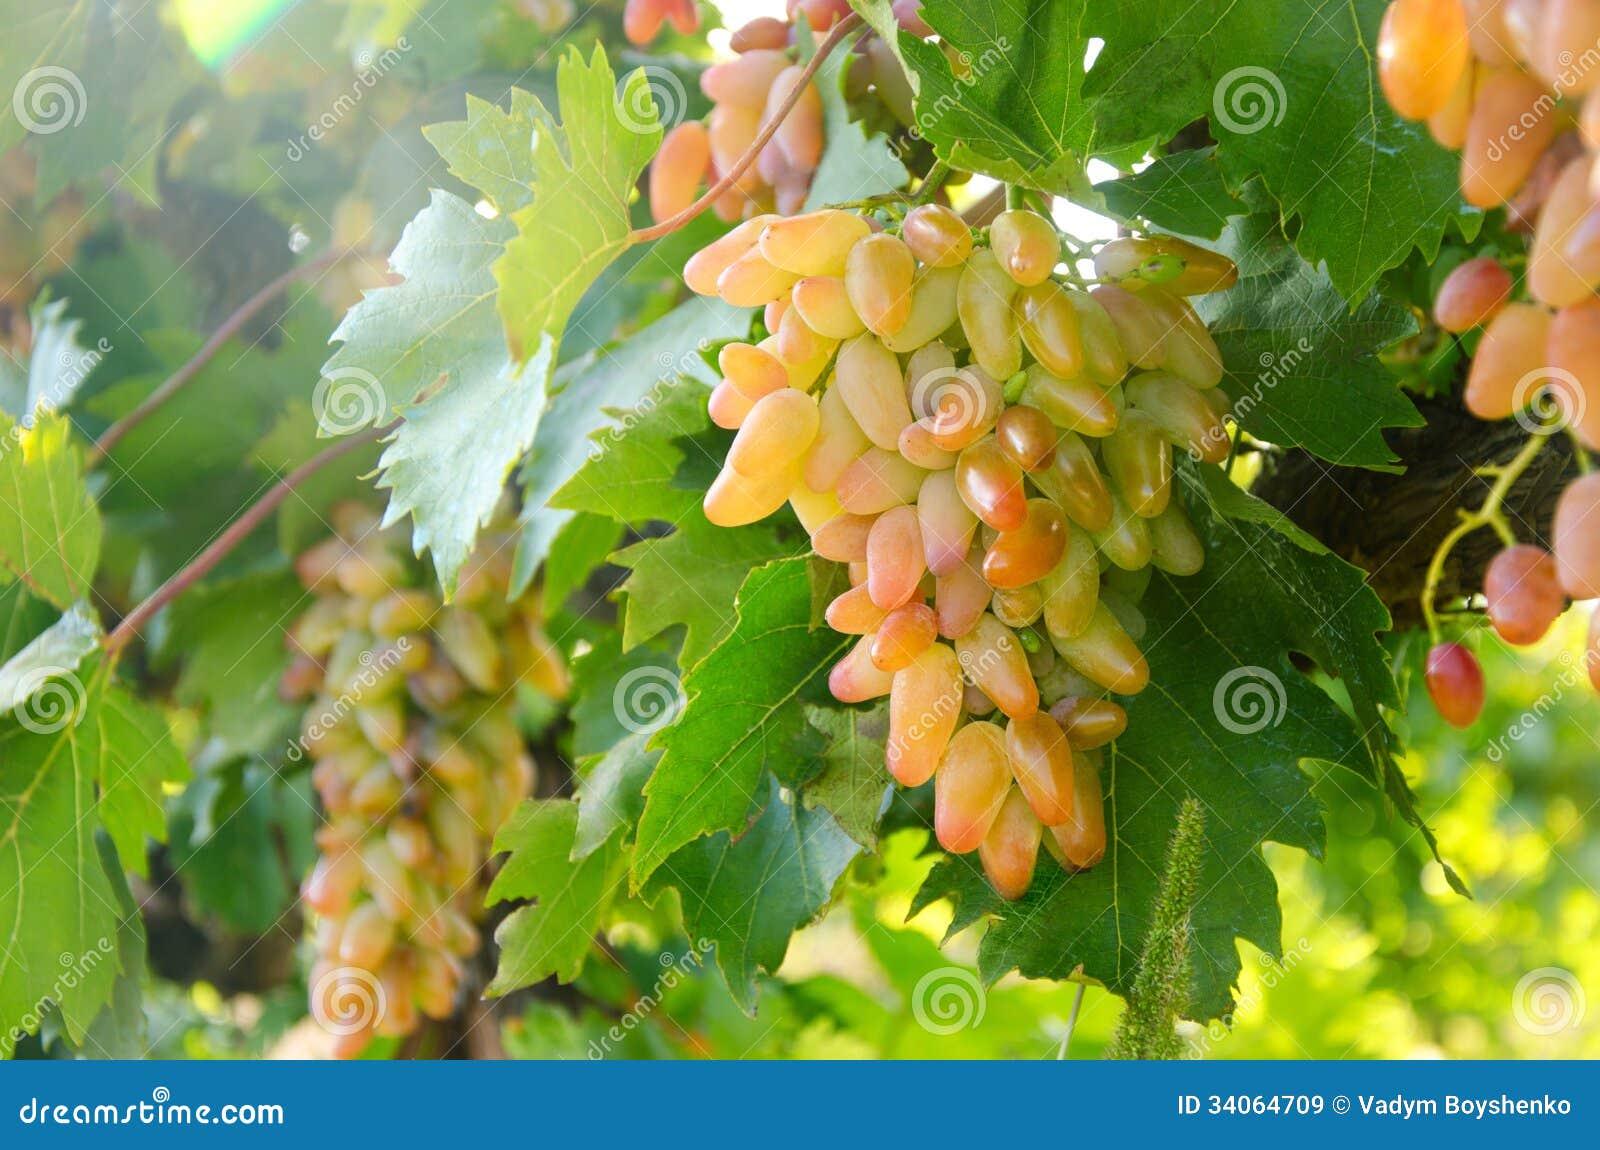 Виноград маникюр фингер описание фото